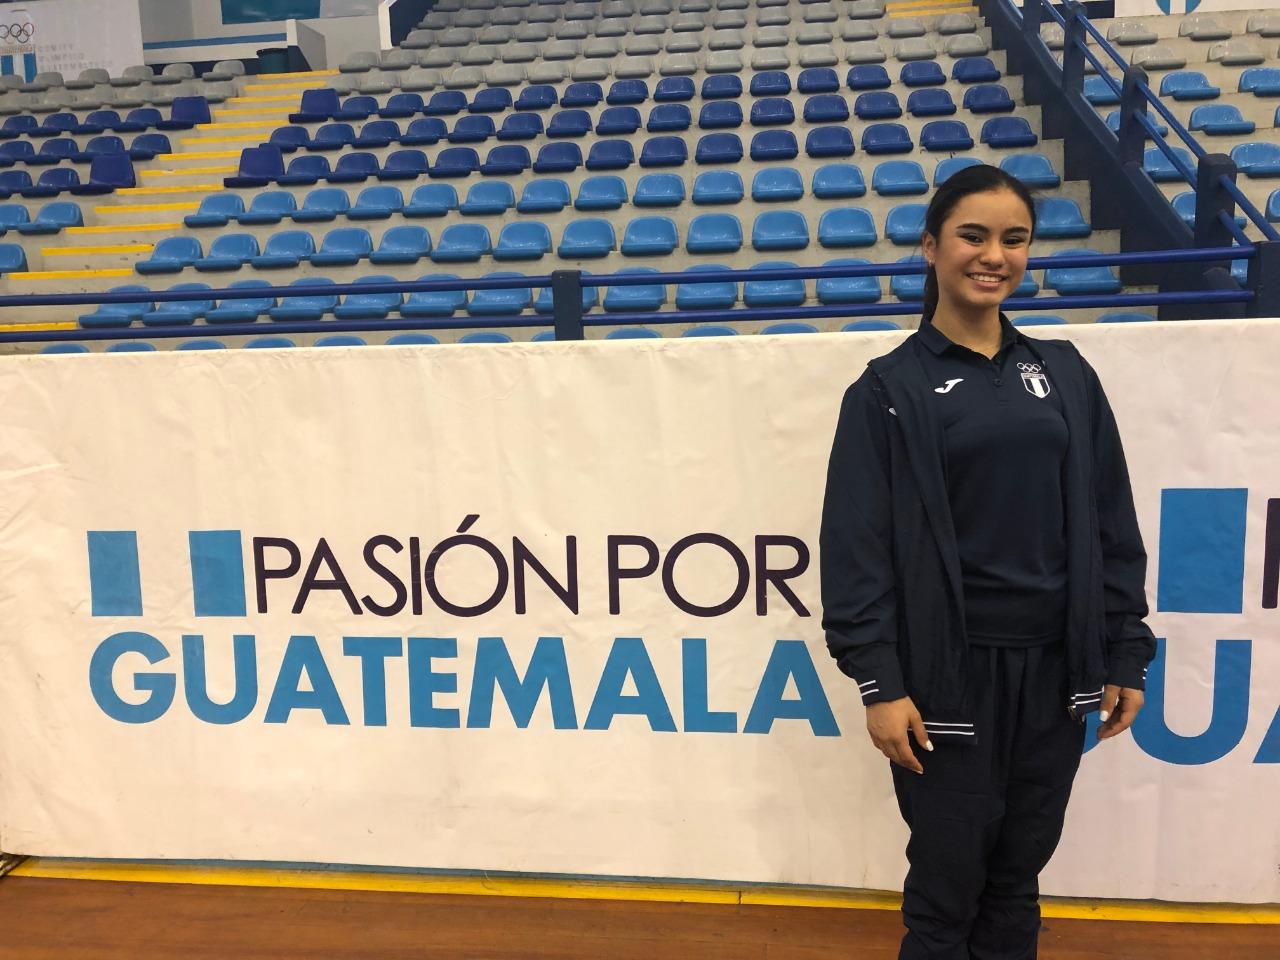 Ana Irene Palacios